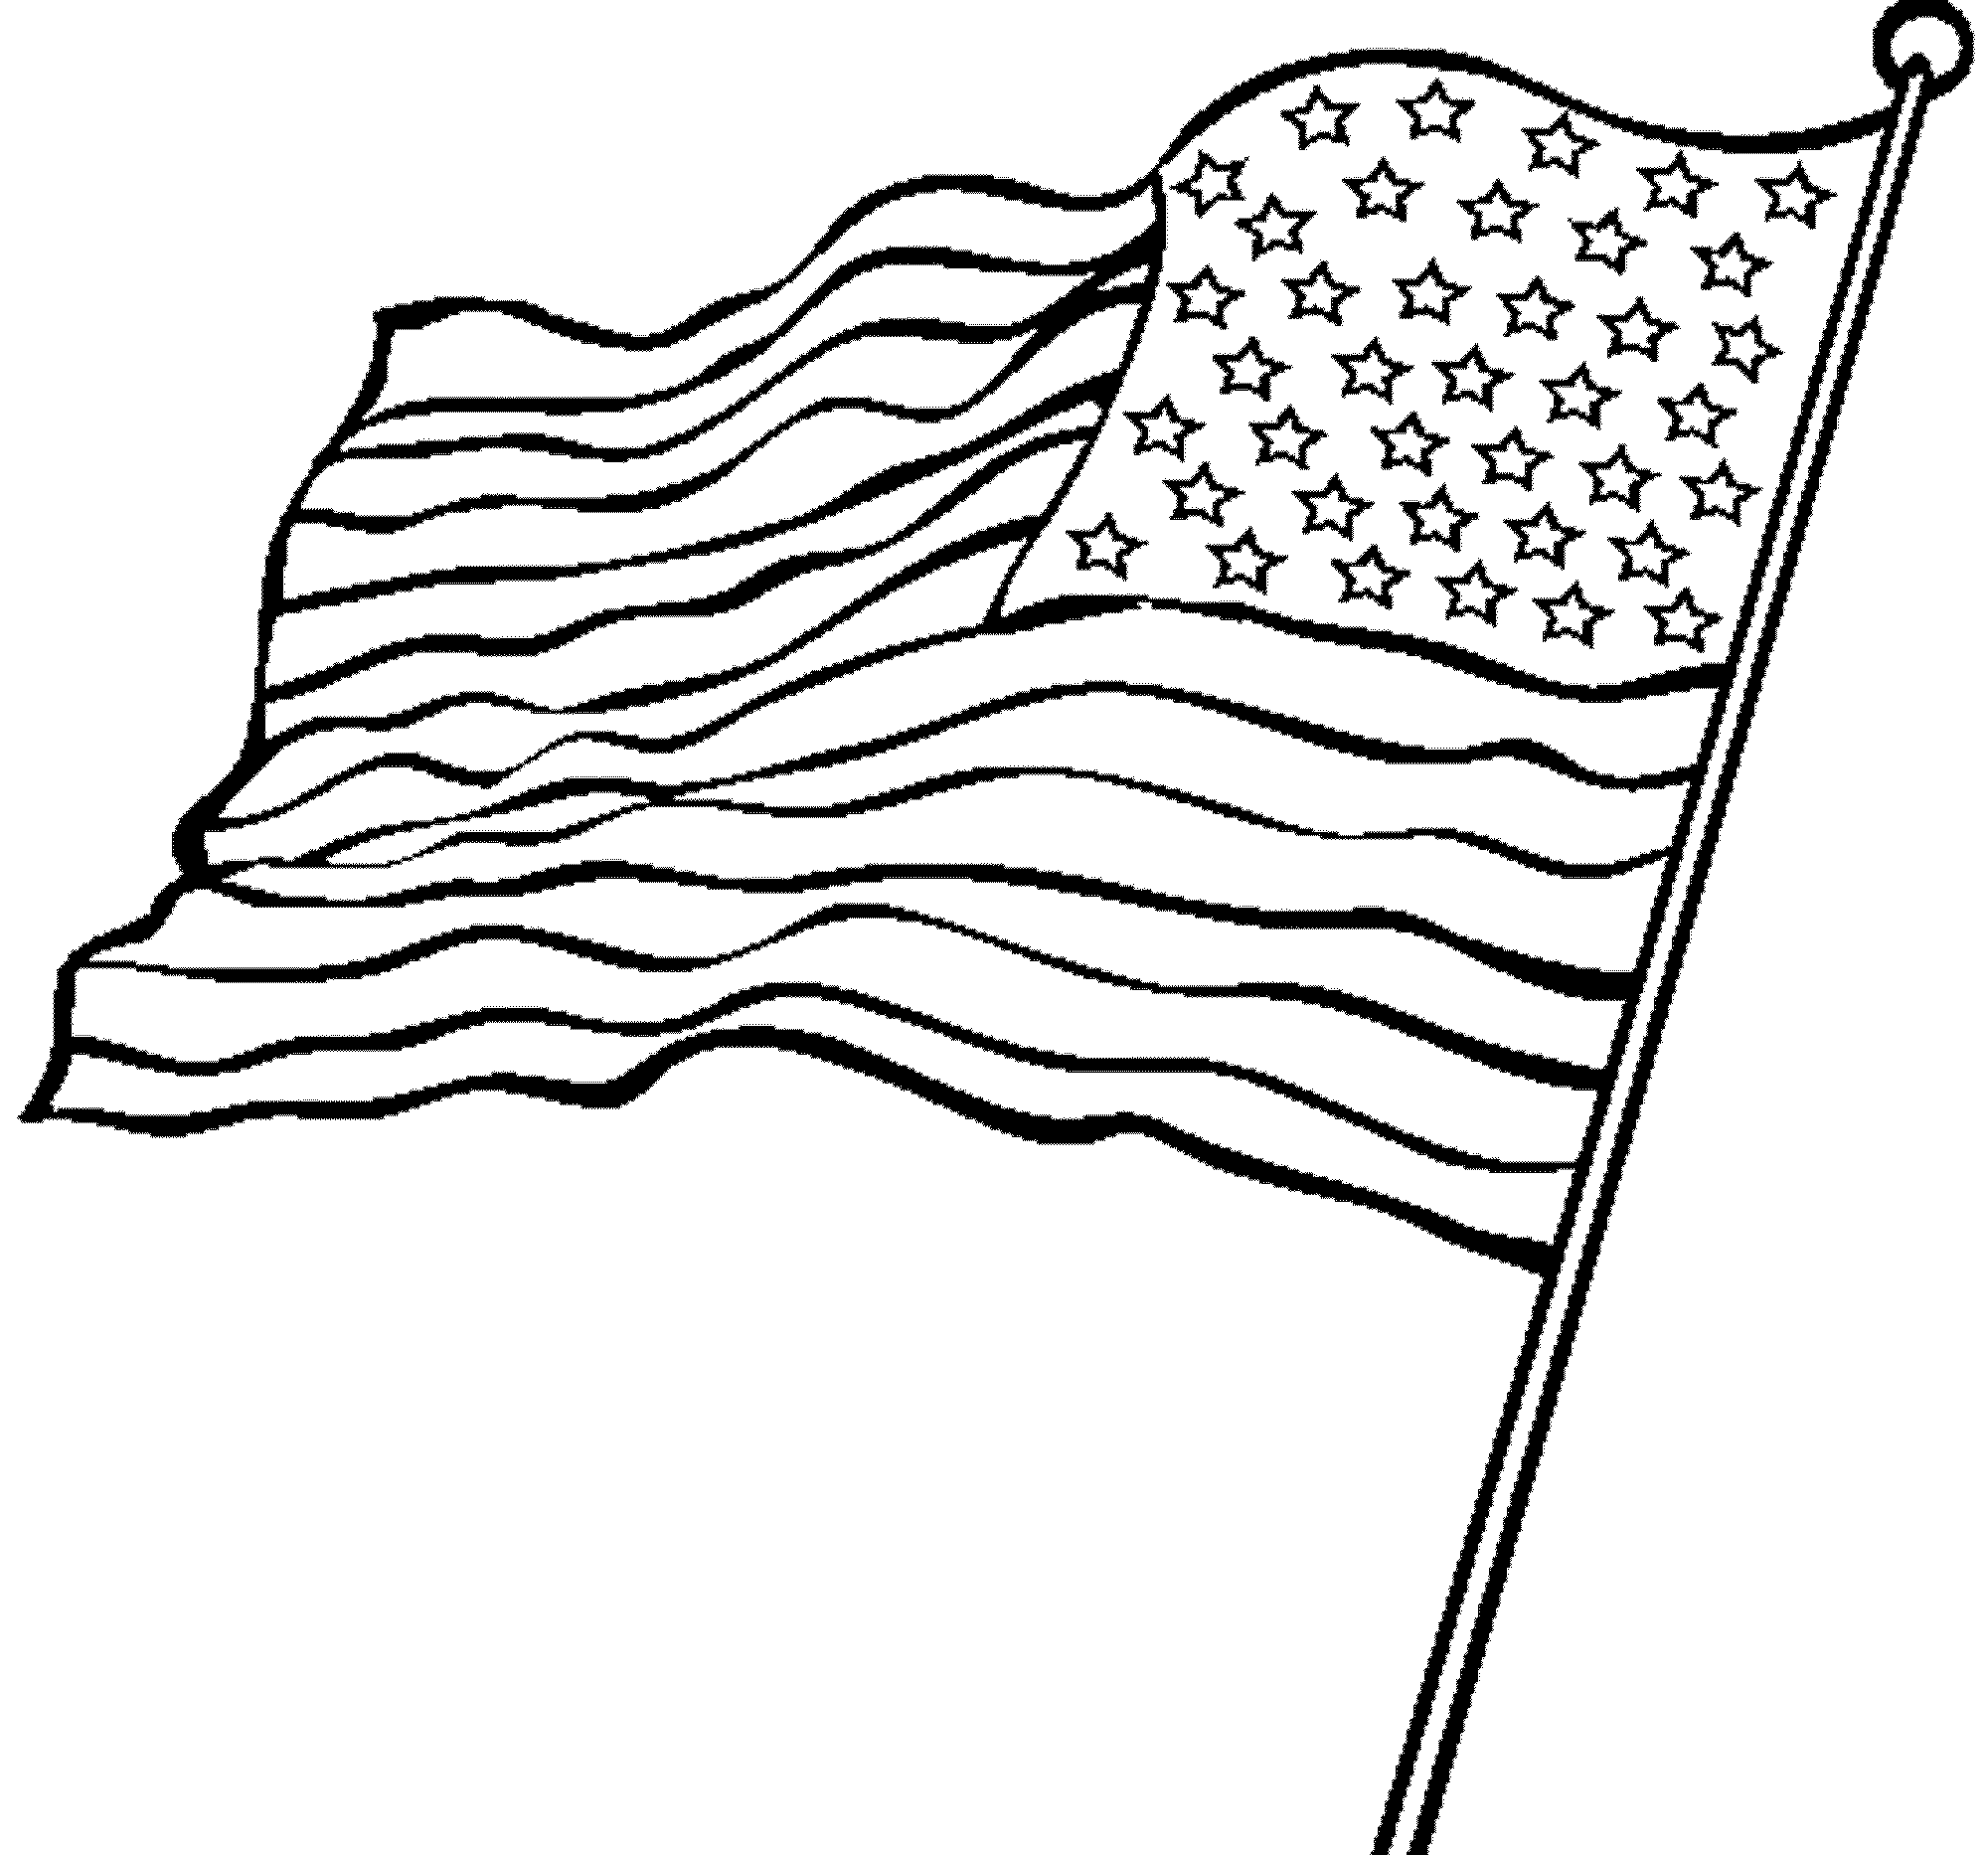 Coloring pages us flag - Yto44e9jc Original American Flag Coloring Page Coloring Home On Small American Flag Coloring Page